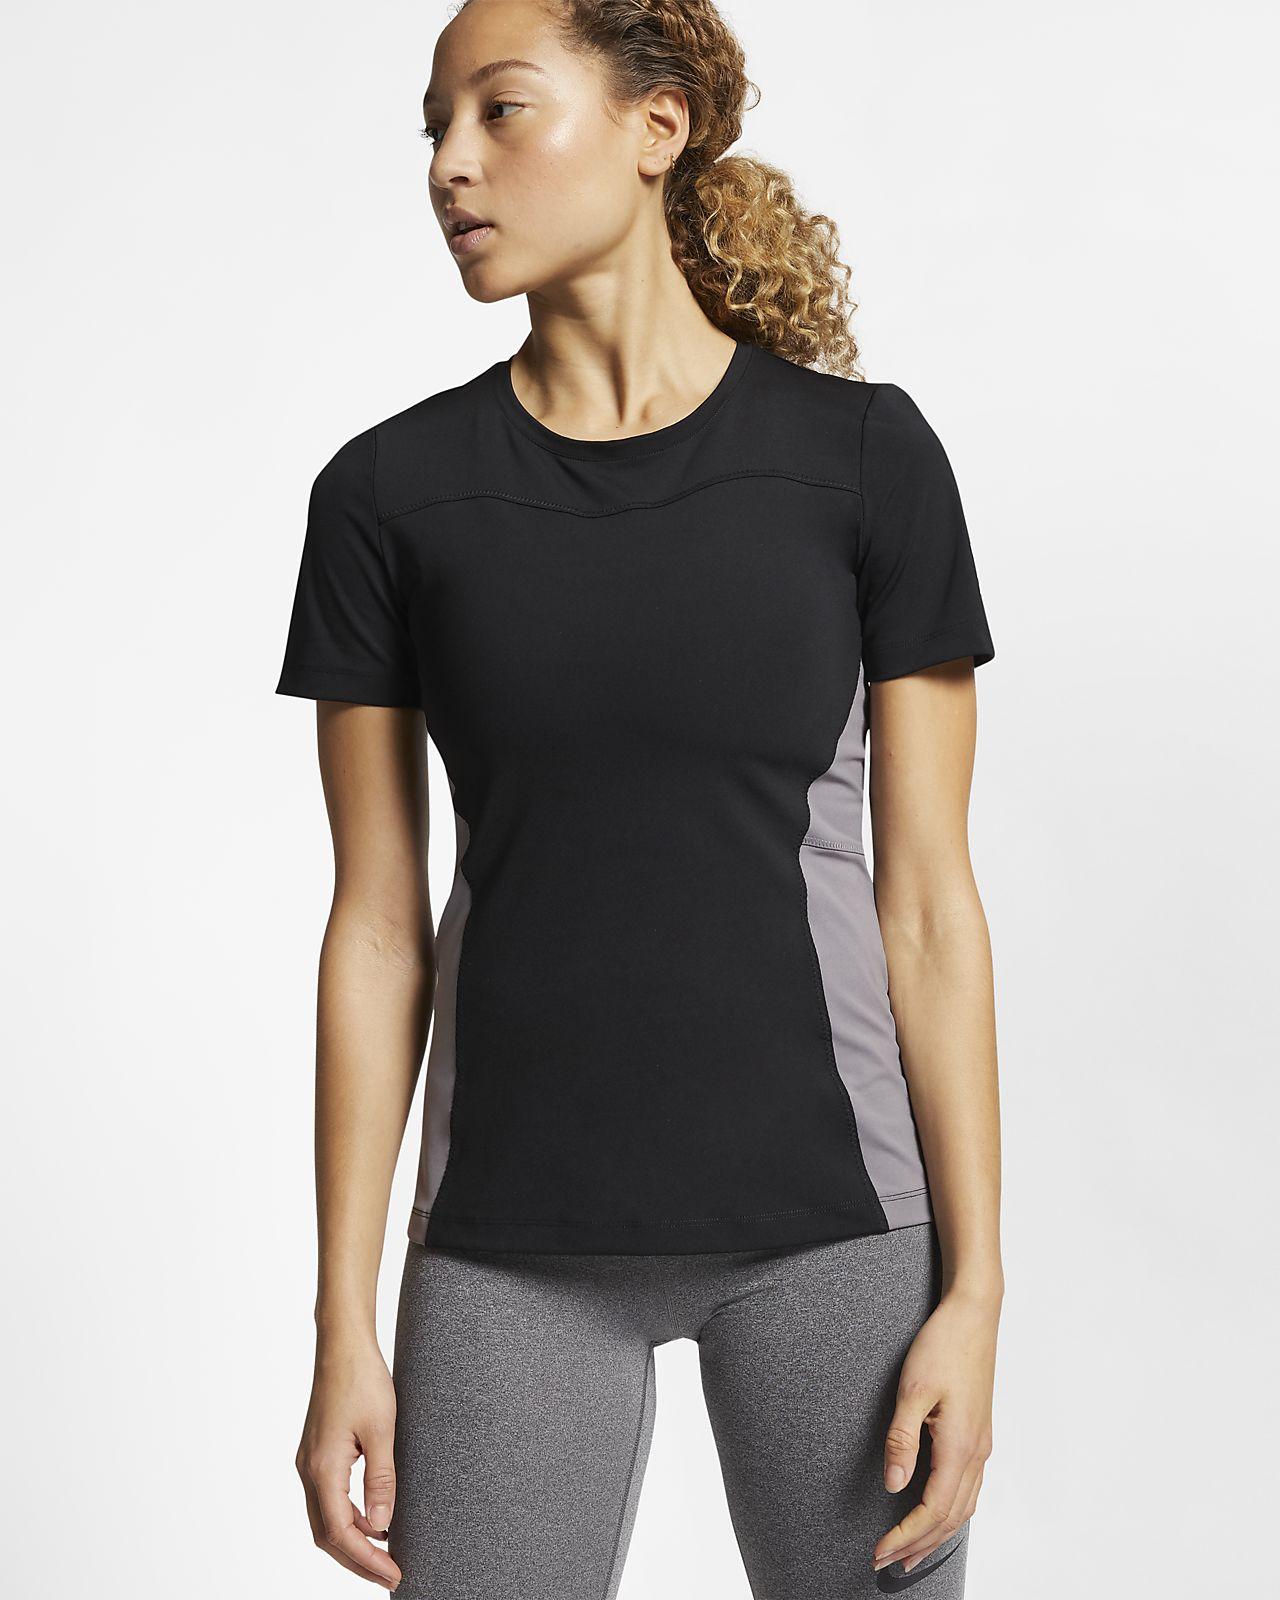 Nike Pro Camiseta de manga corta - Mujer